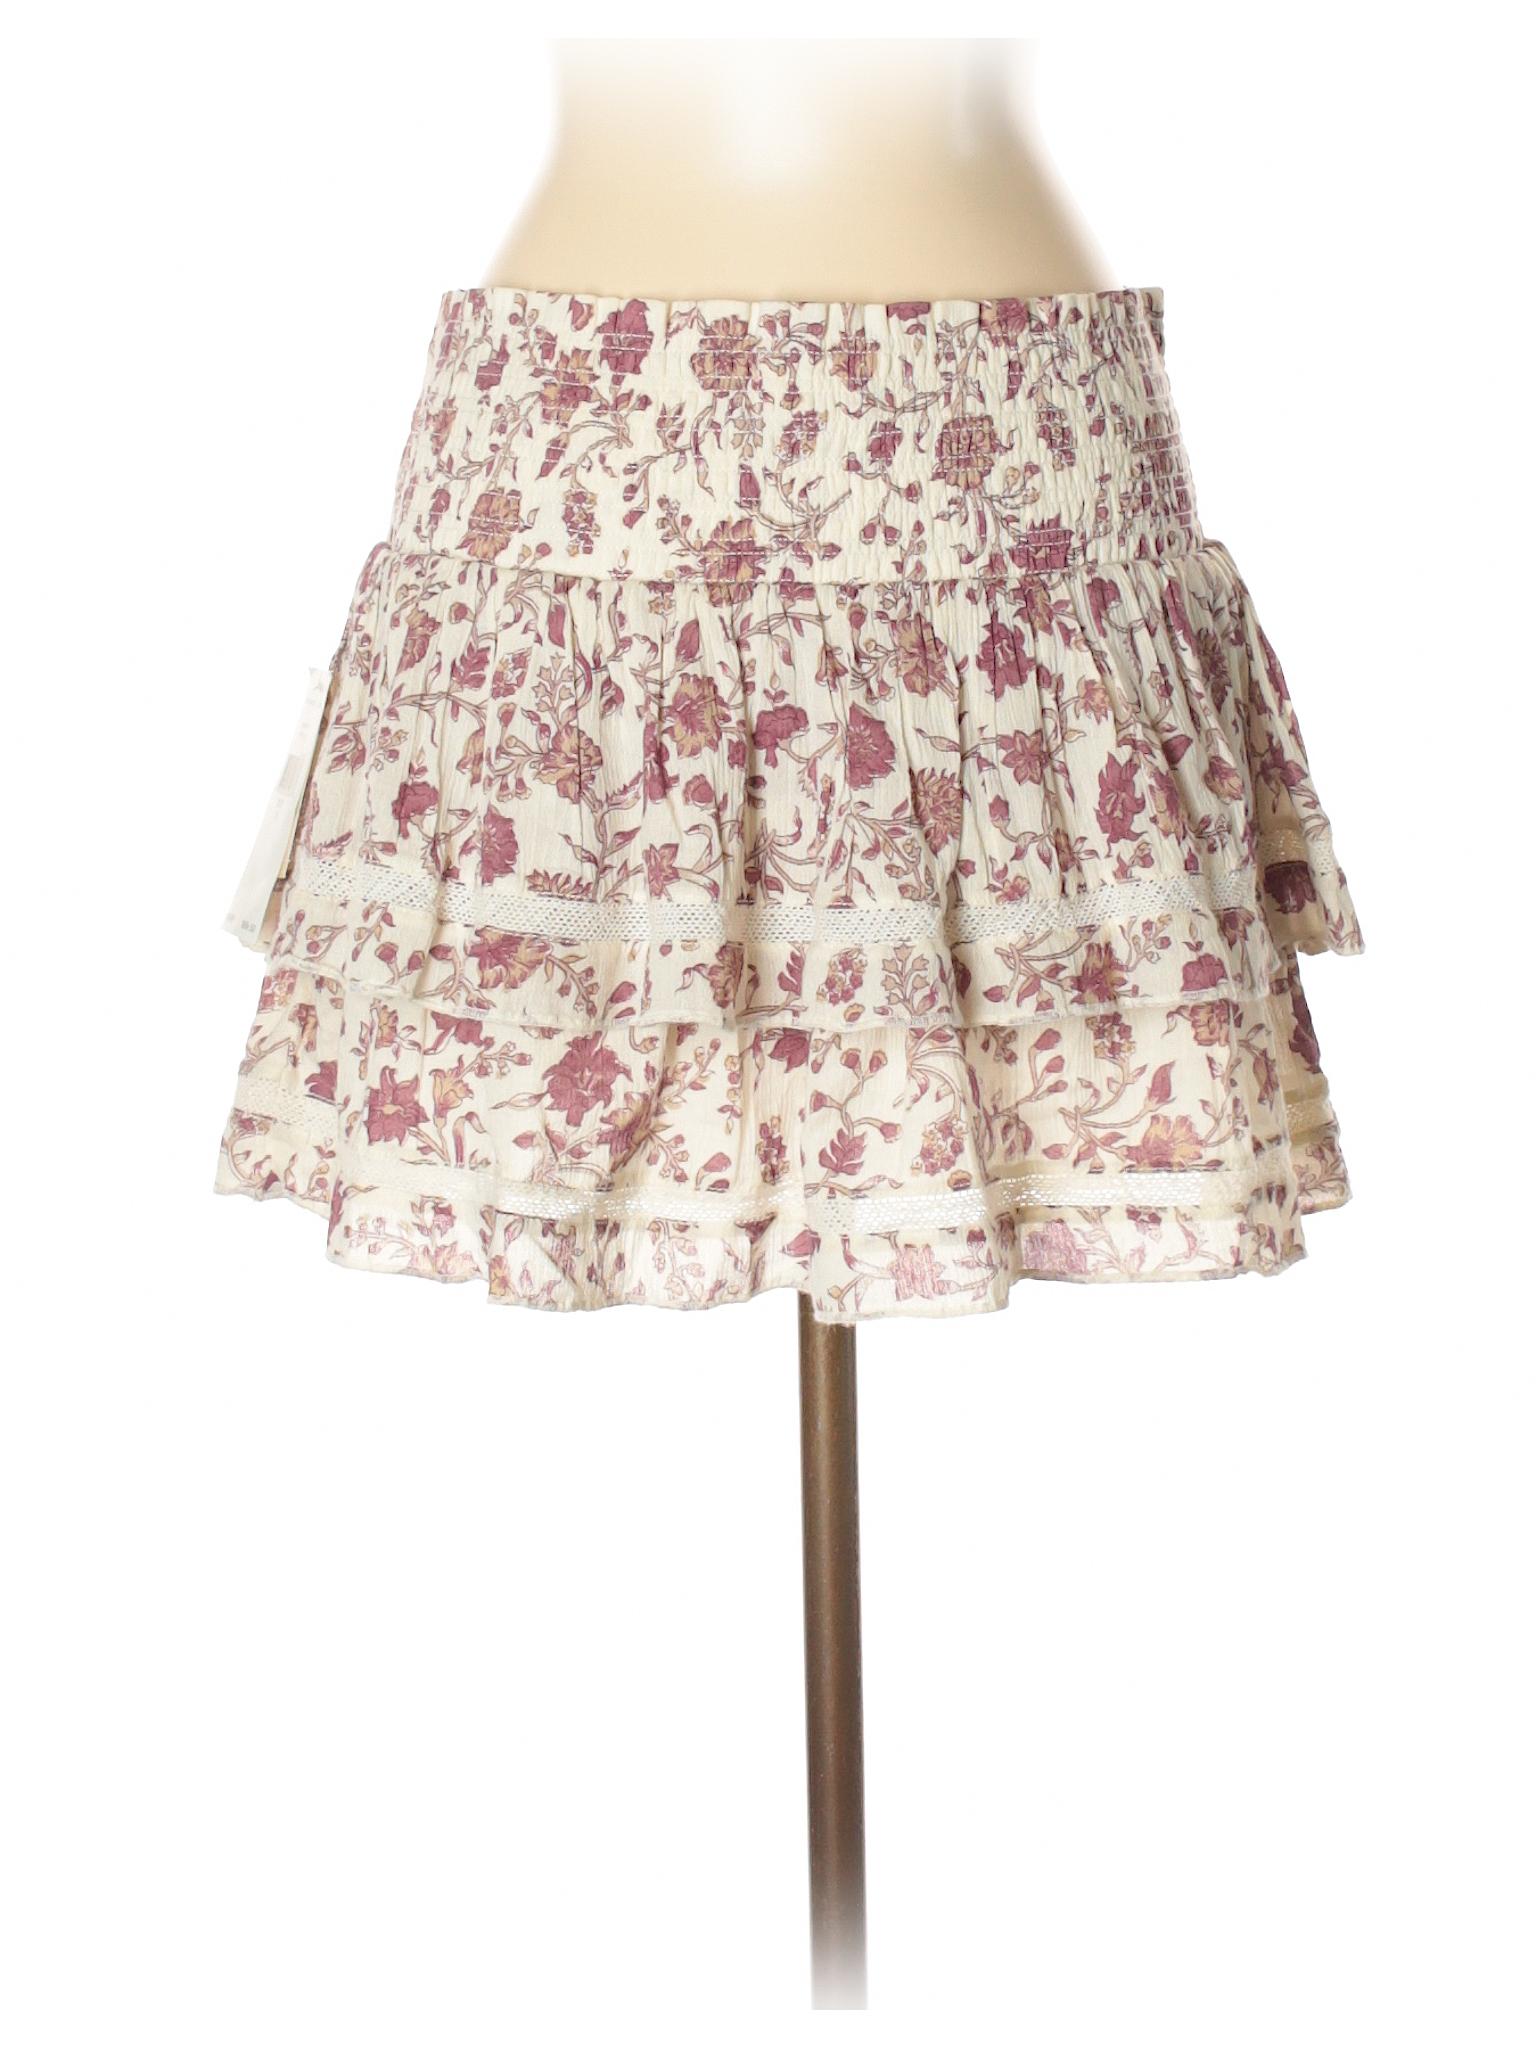 Boutique Casual Skirt Casual Skirt Boutique Casual Skirt Casual Boutique Boutique Skirt 5BRxRd4q